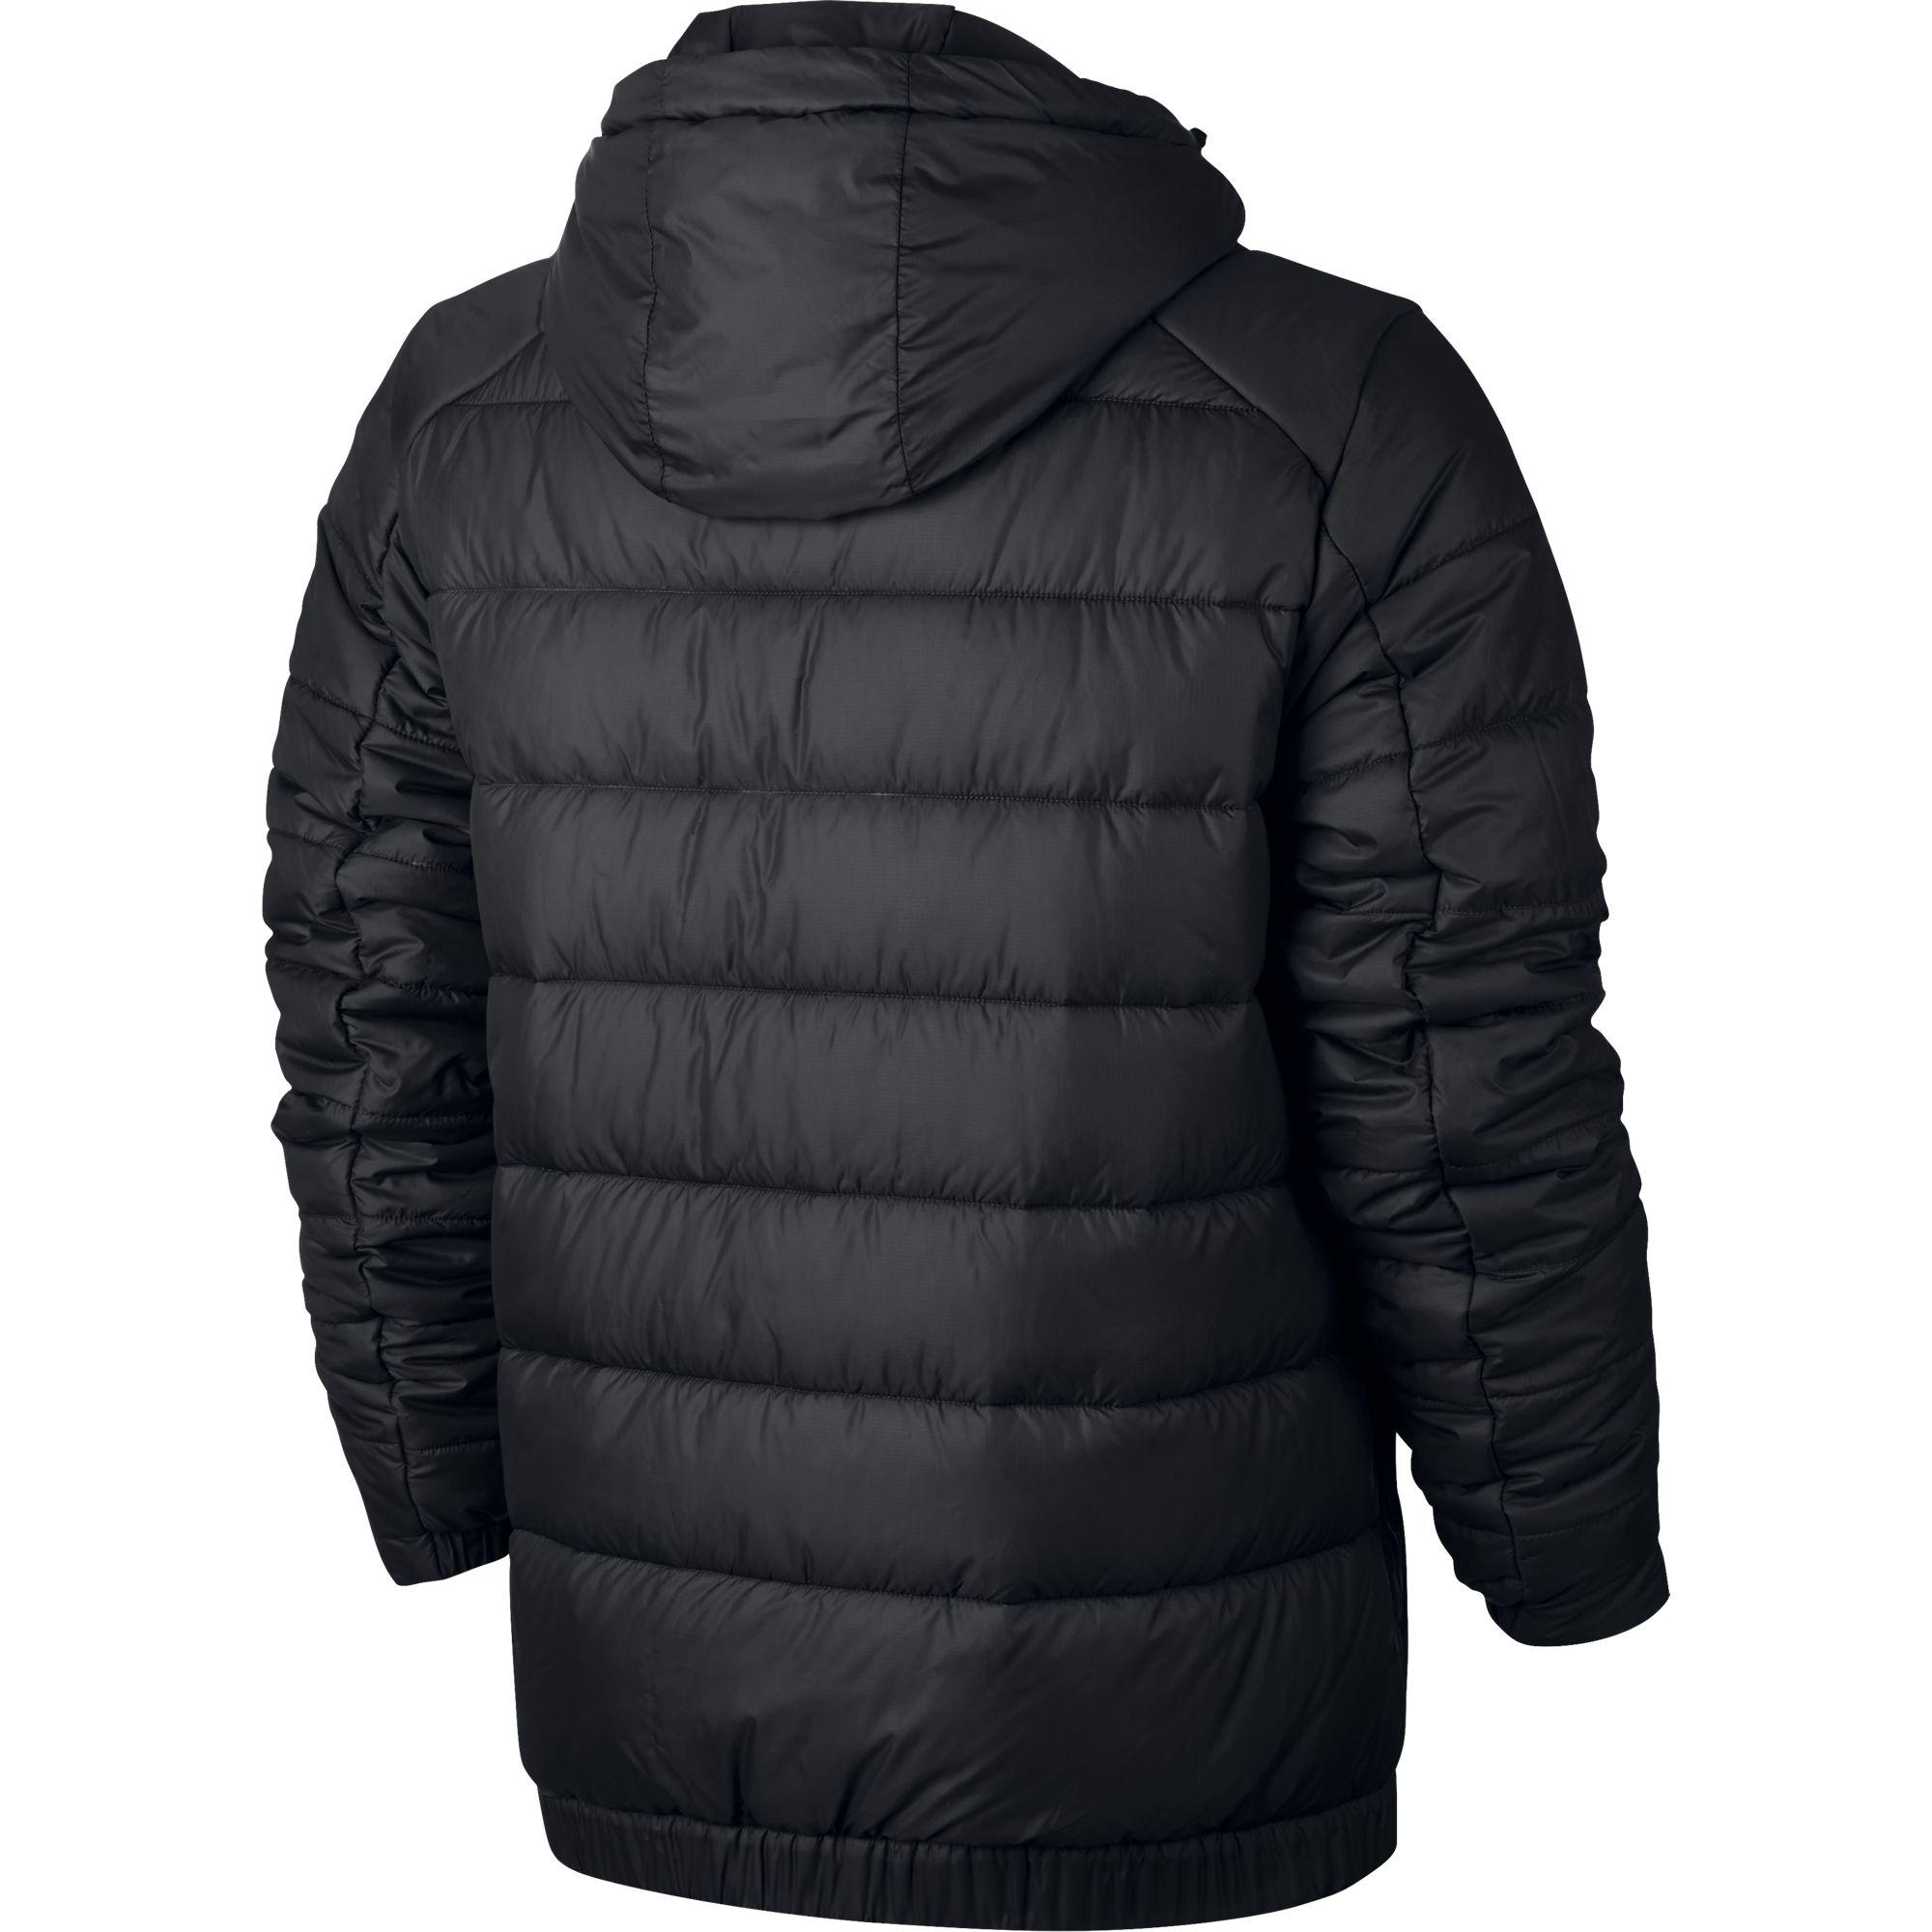 Nike Mens Sportswear Jacket Black White Tennisnuts Com